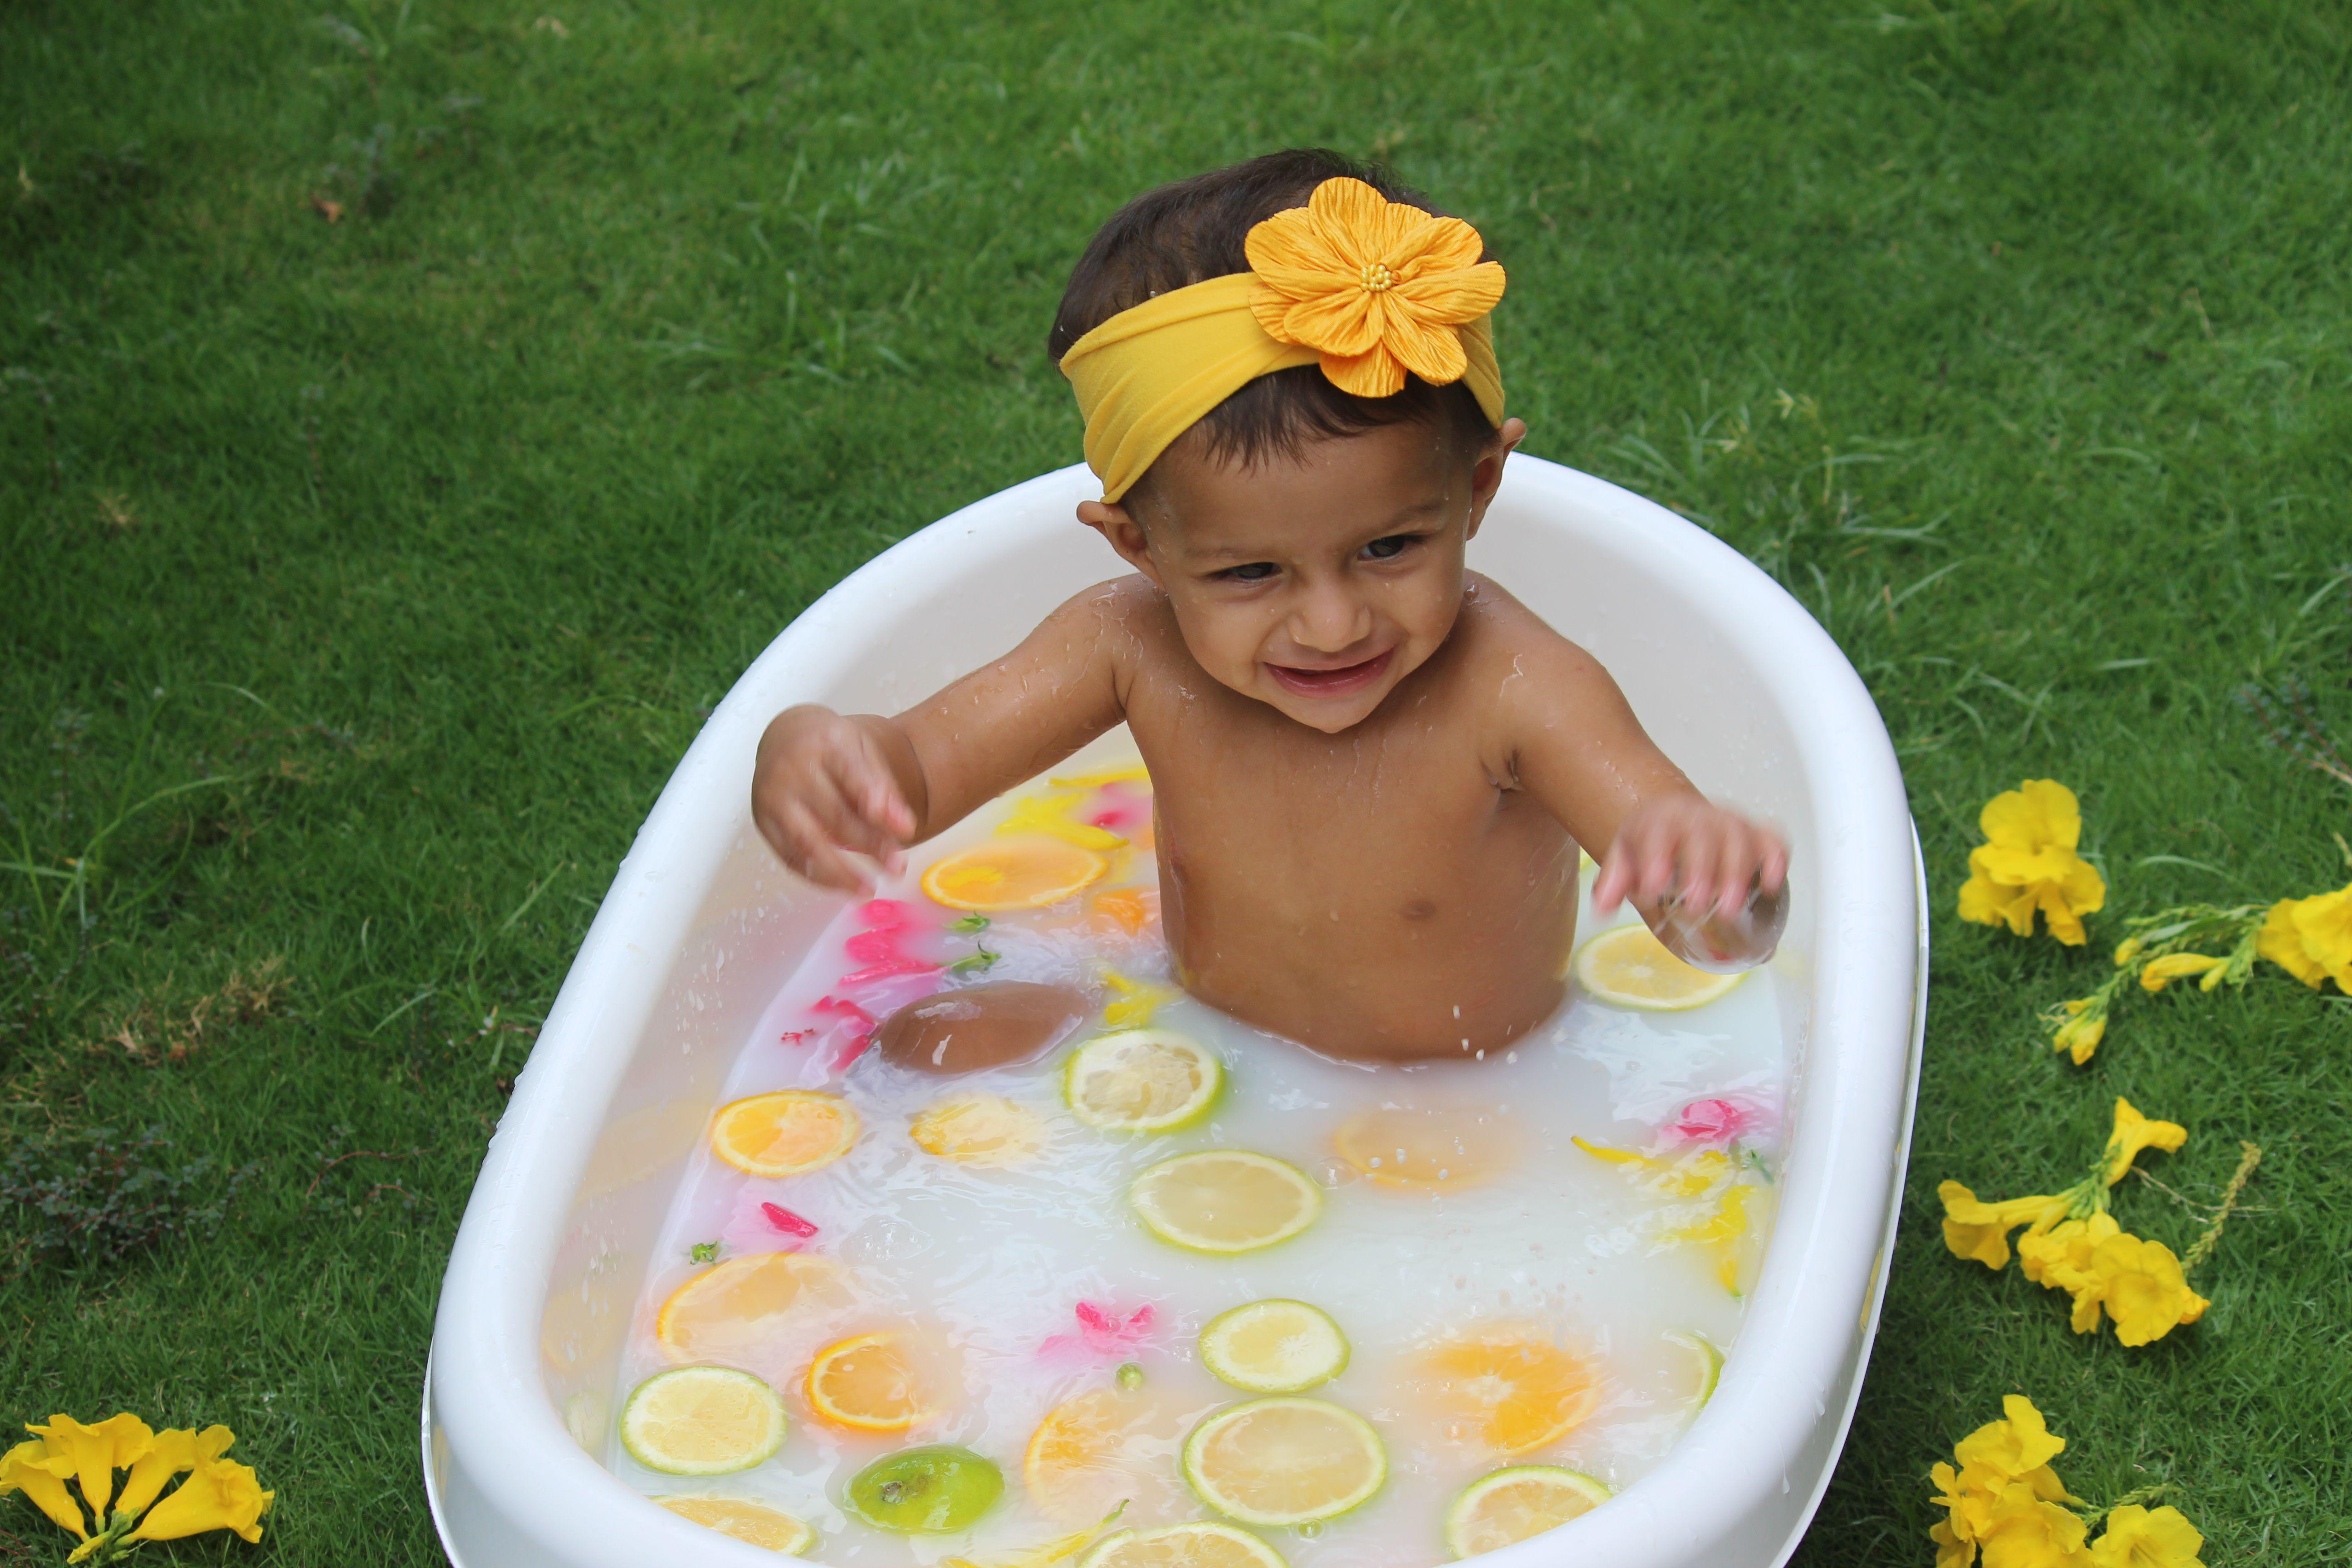 Baby girlphoto shoot ideas